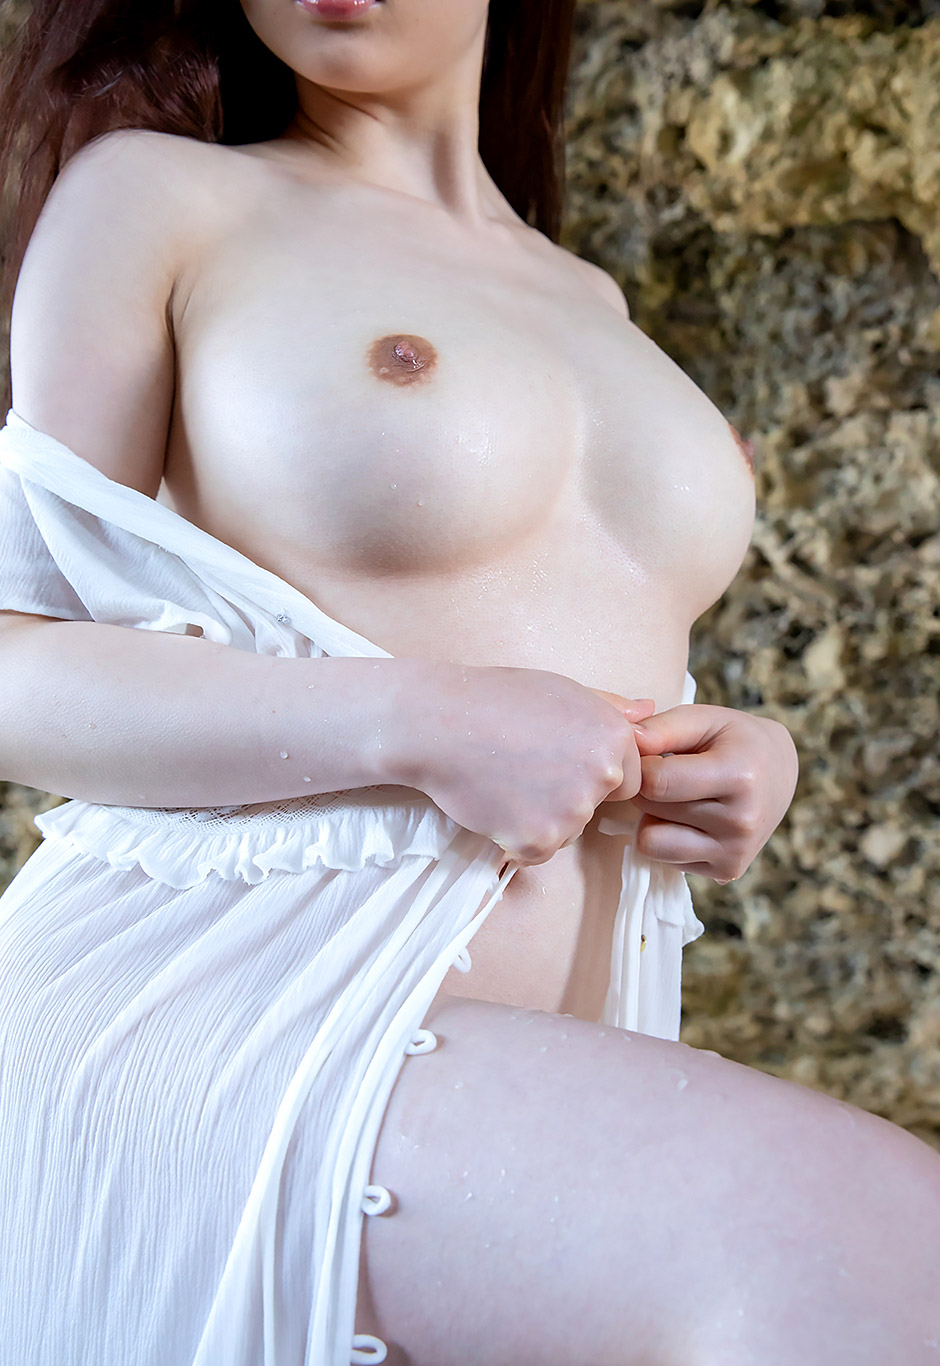 Milf vid porn-3357